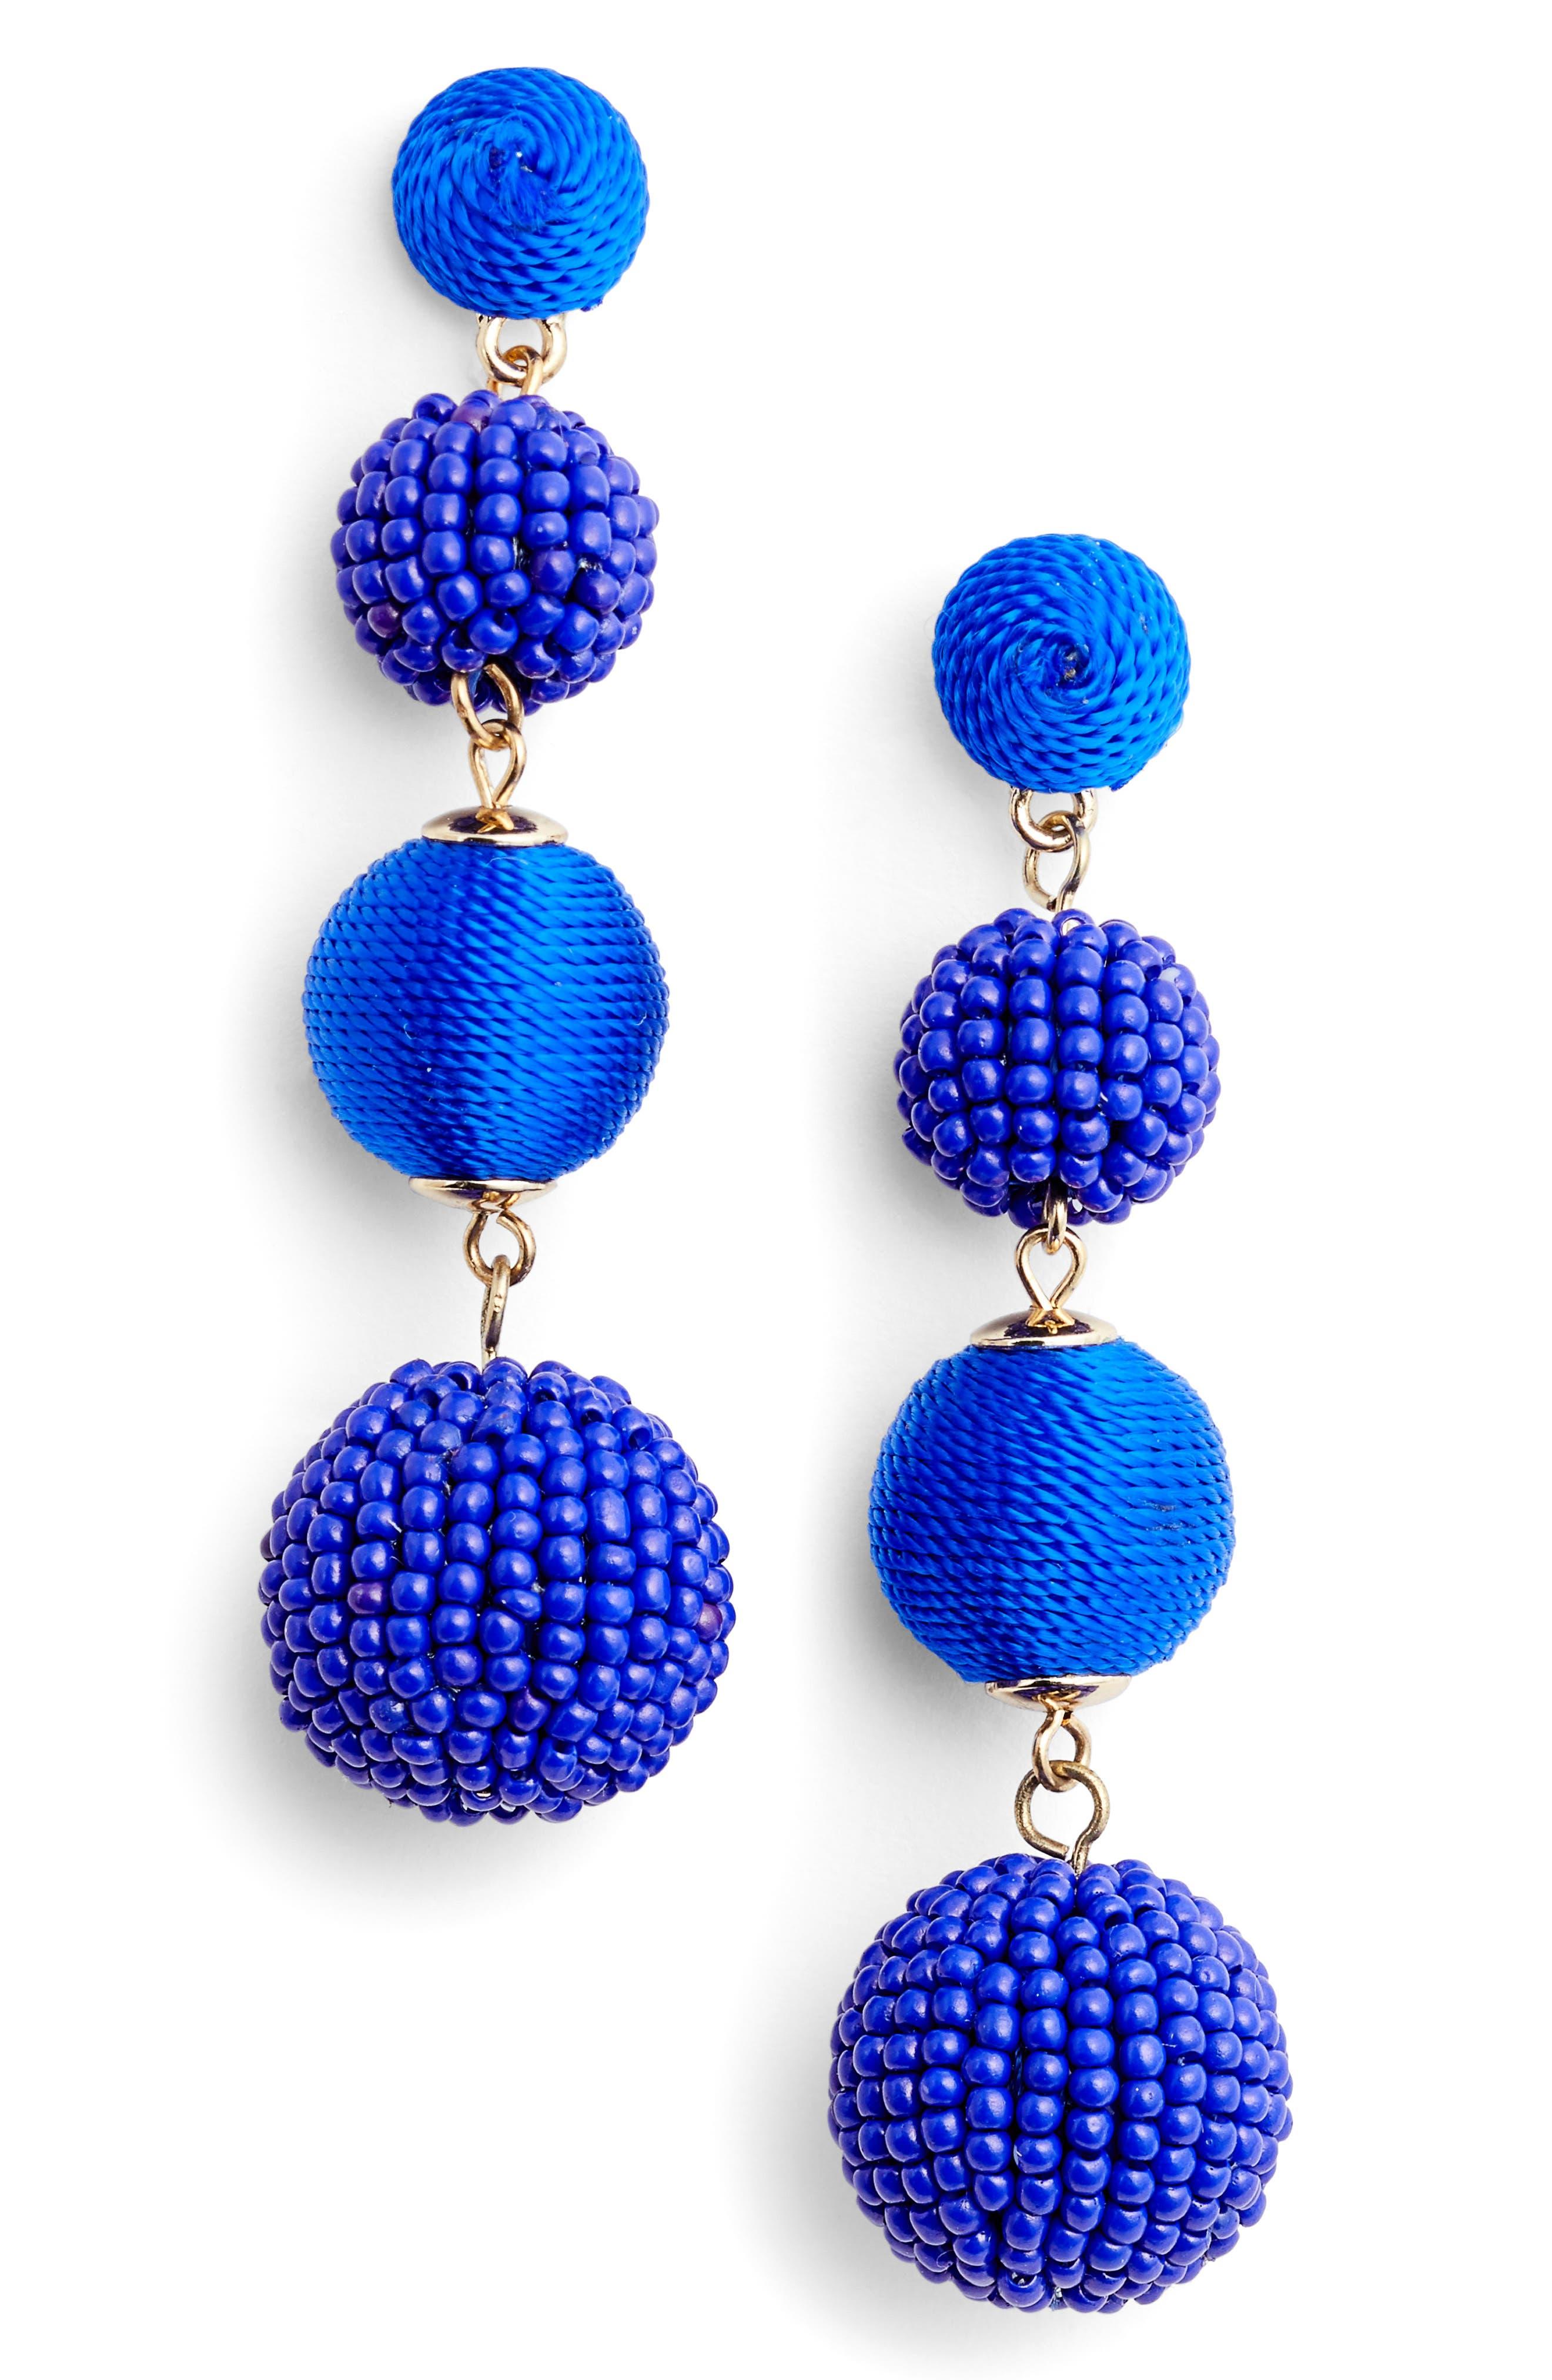 Mixed Bead & Thread Drop Earrings,                             Main thumbnail 1, color,                             Blue